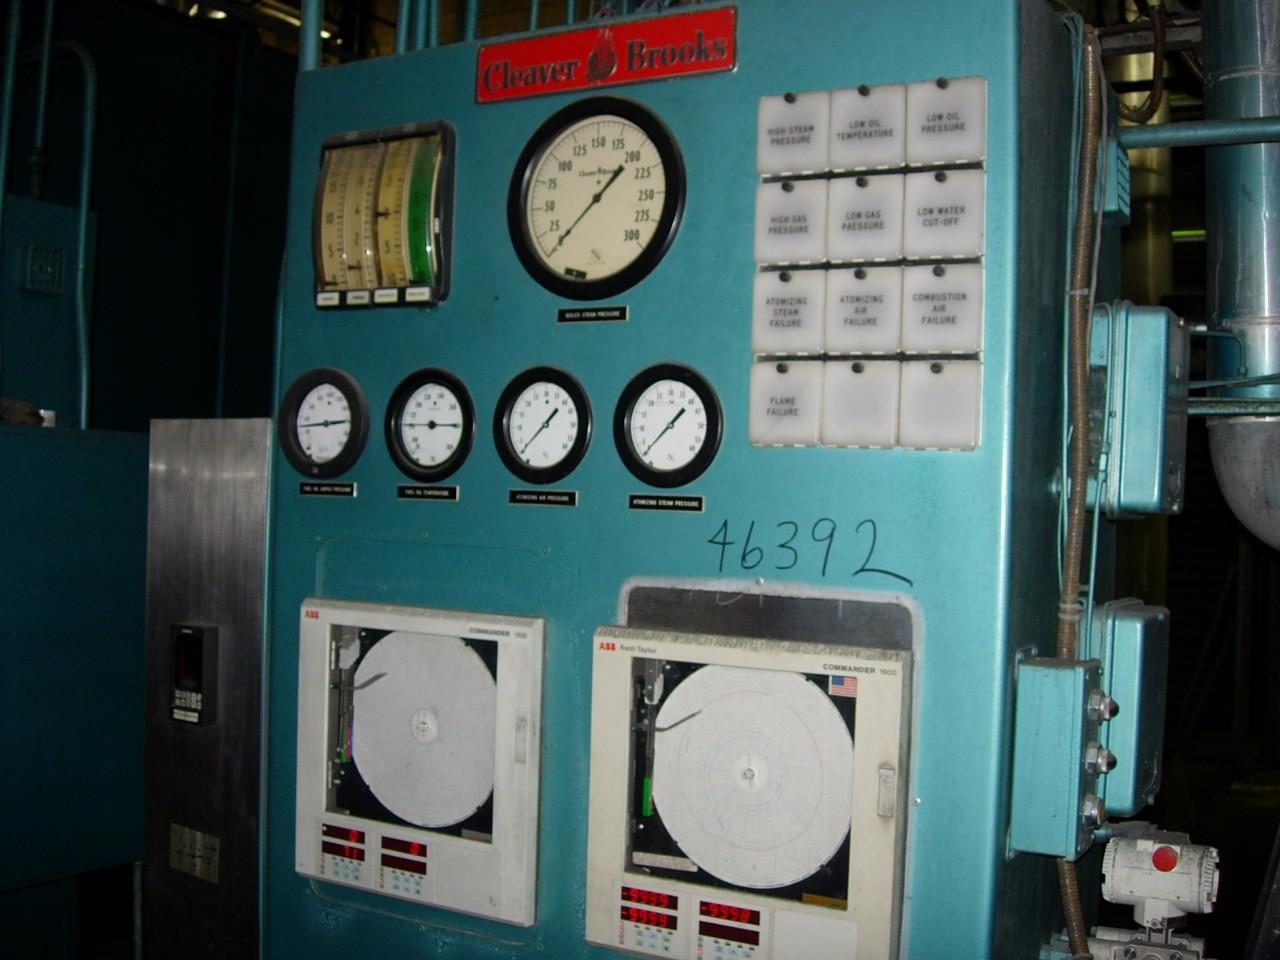 Cleaver Brooks D-52 Water Tube Boiler